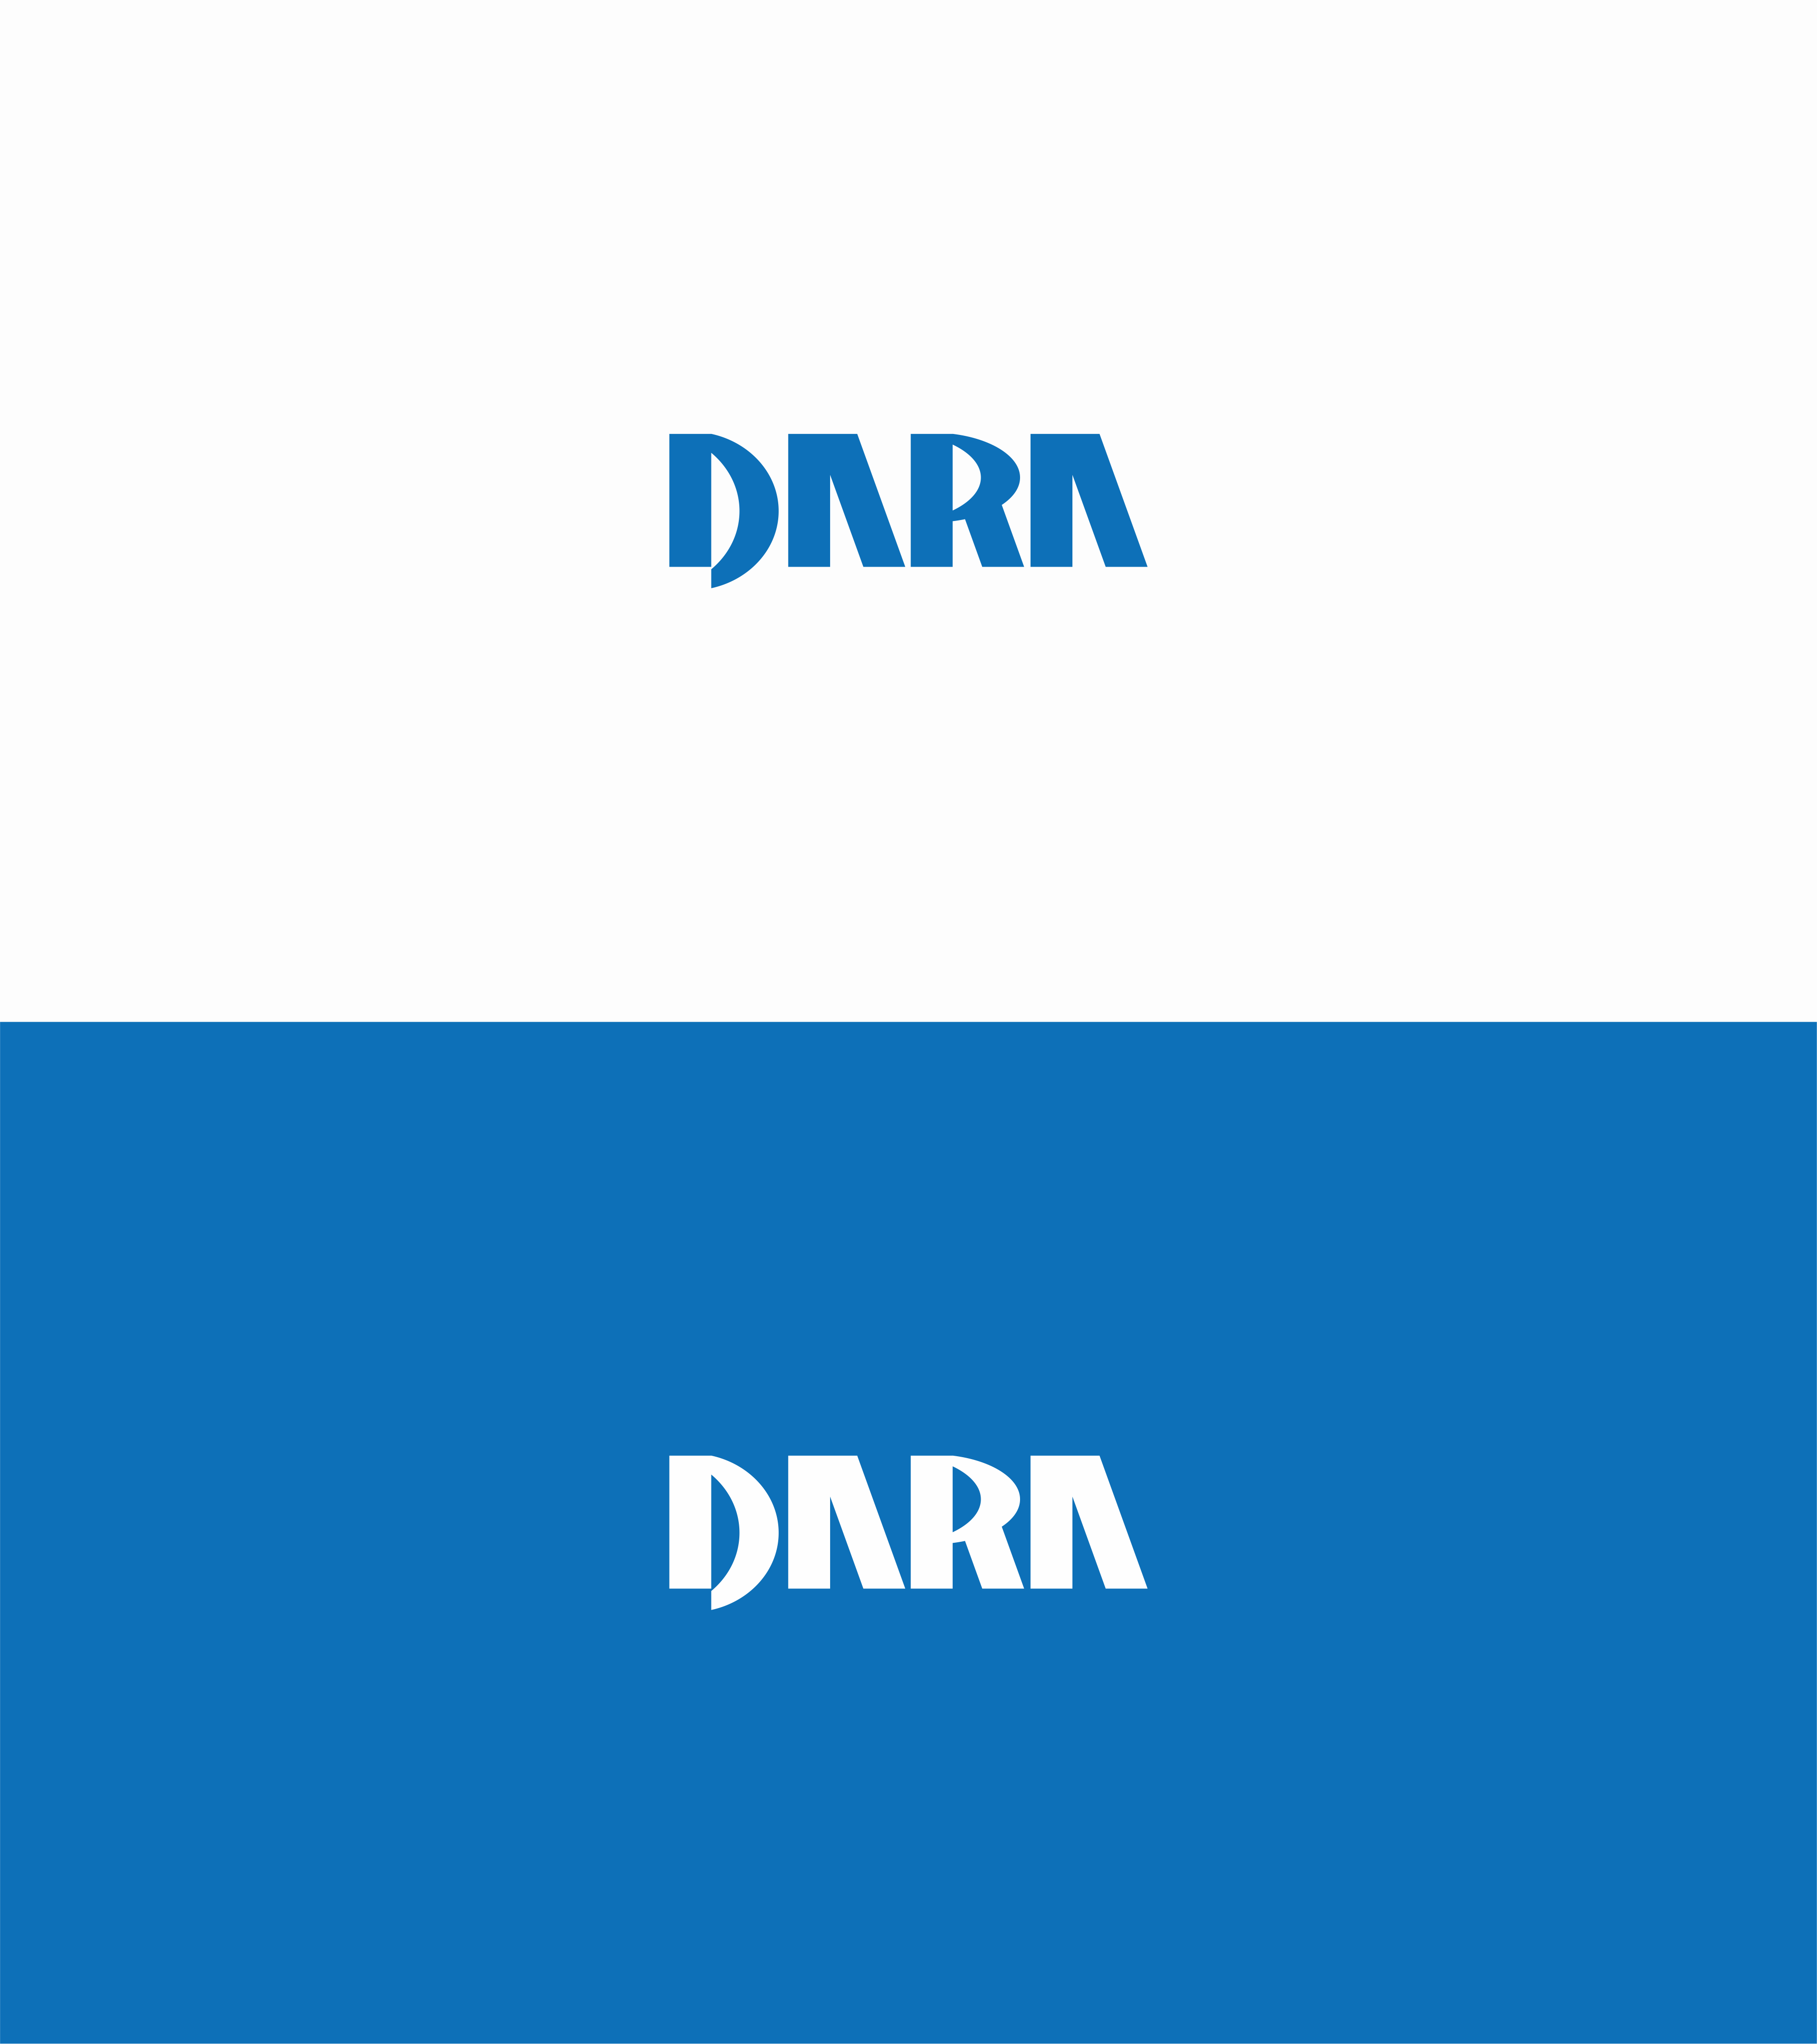 DARA  logo设计_3034677_k68威客网